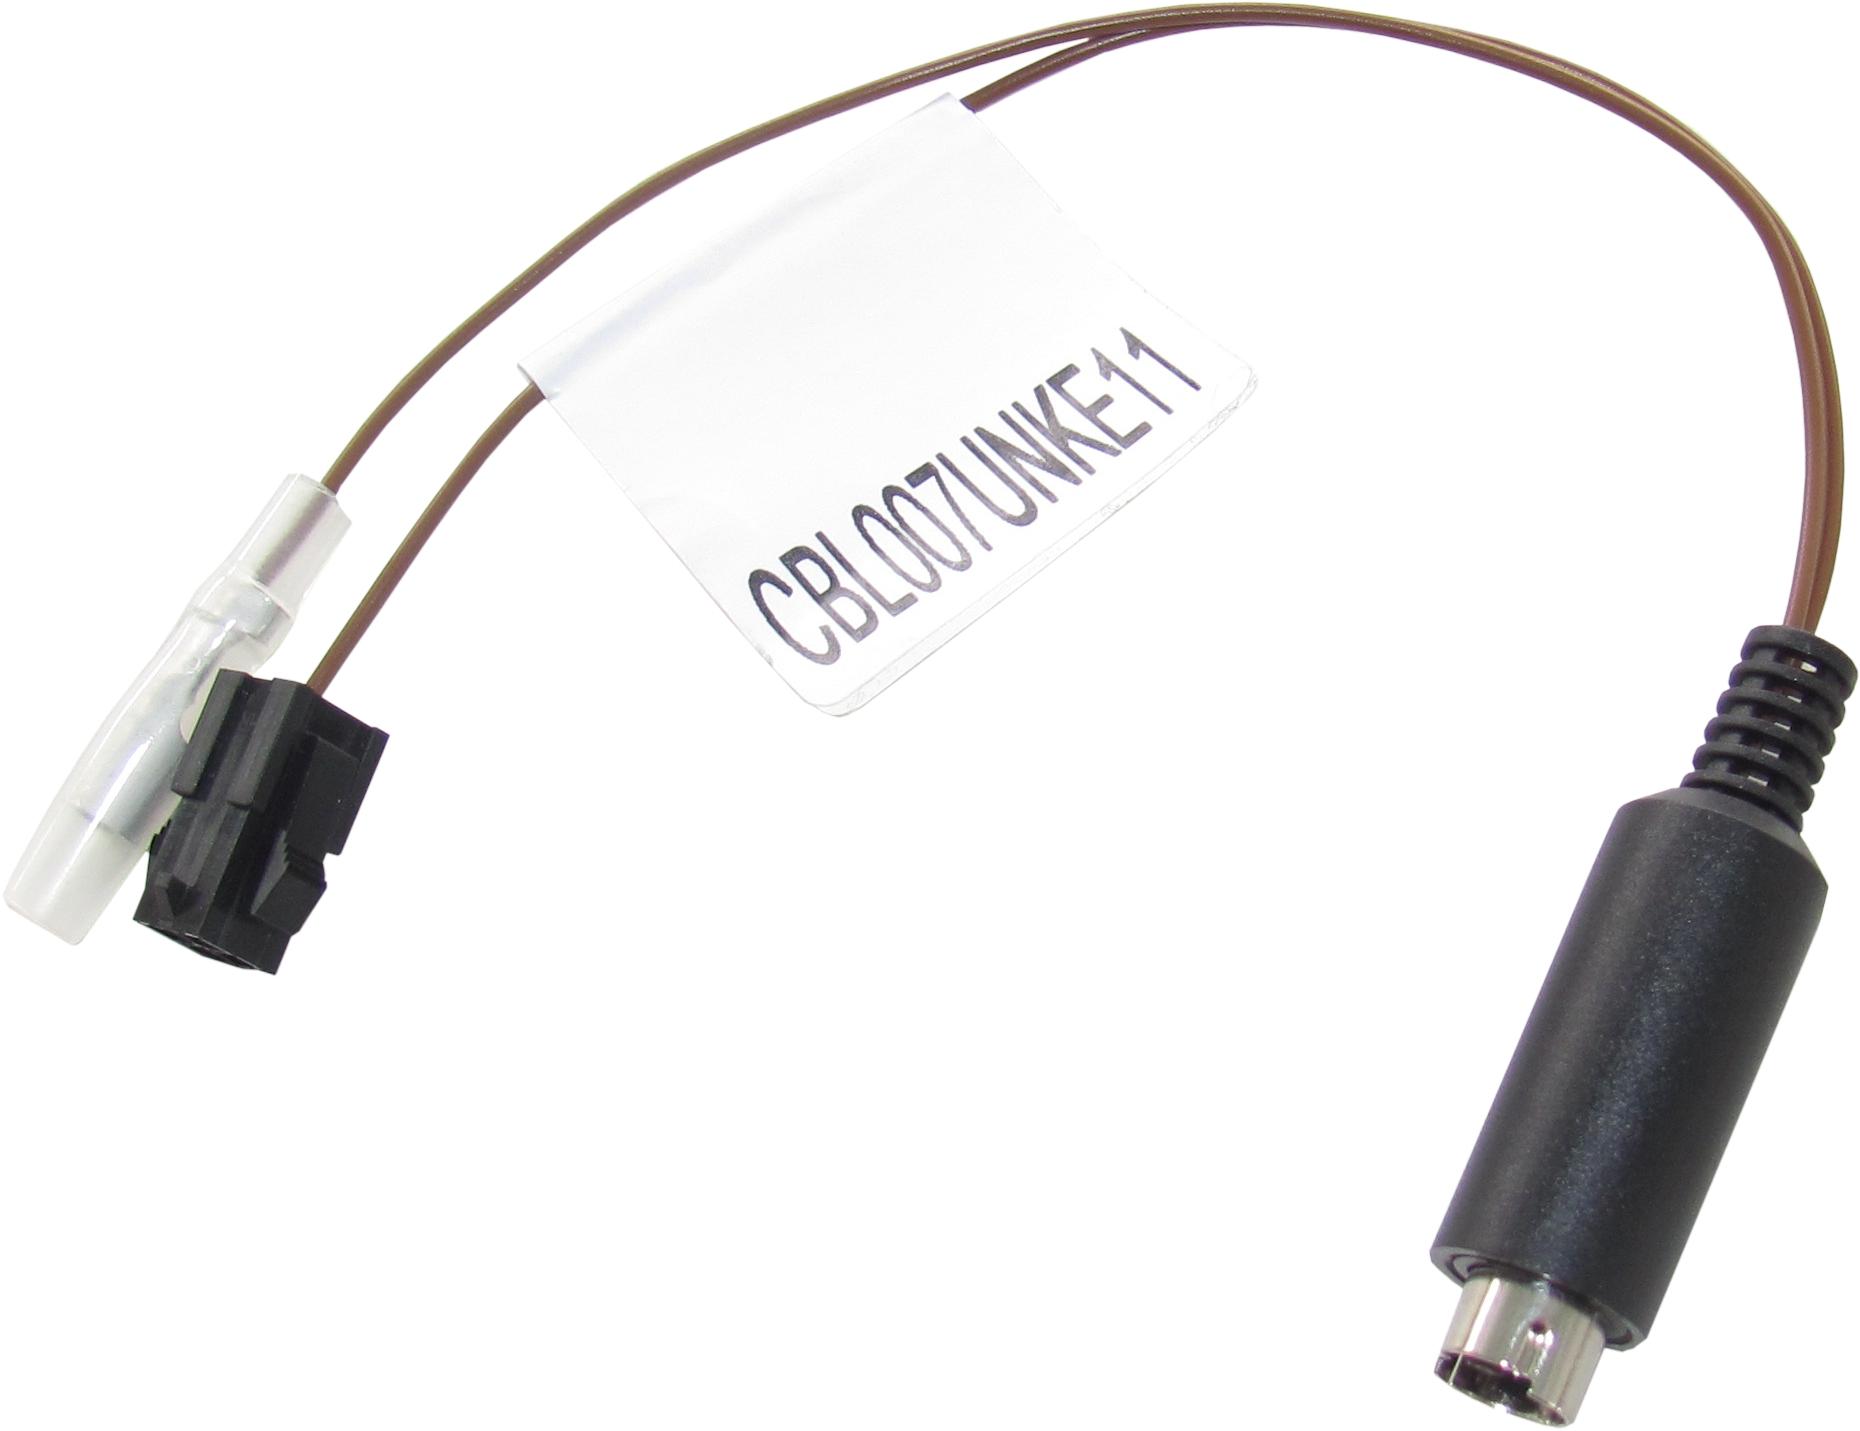 Kabel k 10993kit / UNI adaptéru CAN-Bus/ovládání KENWOOD